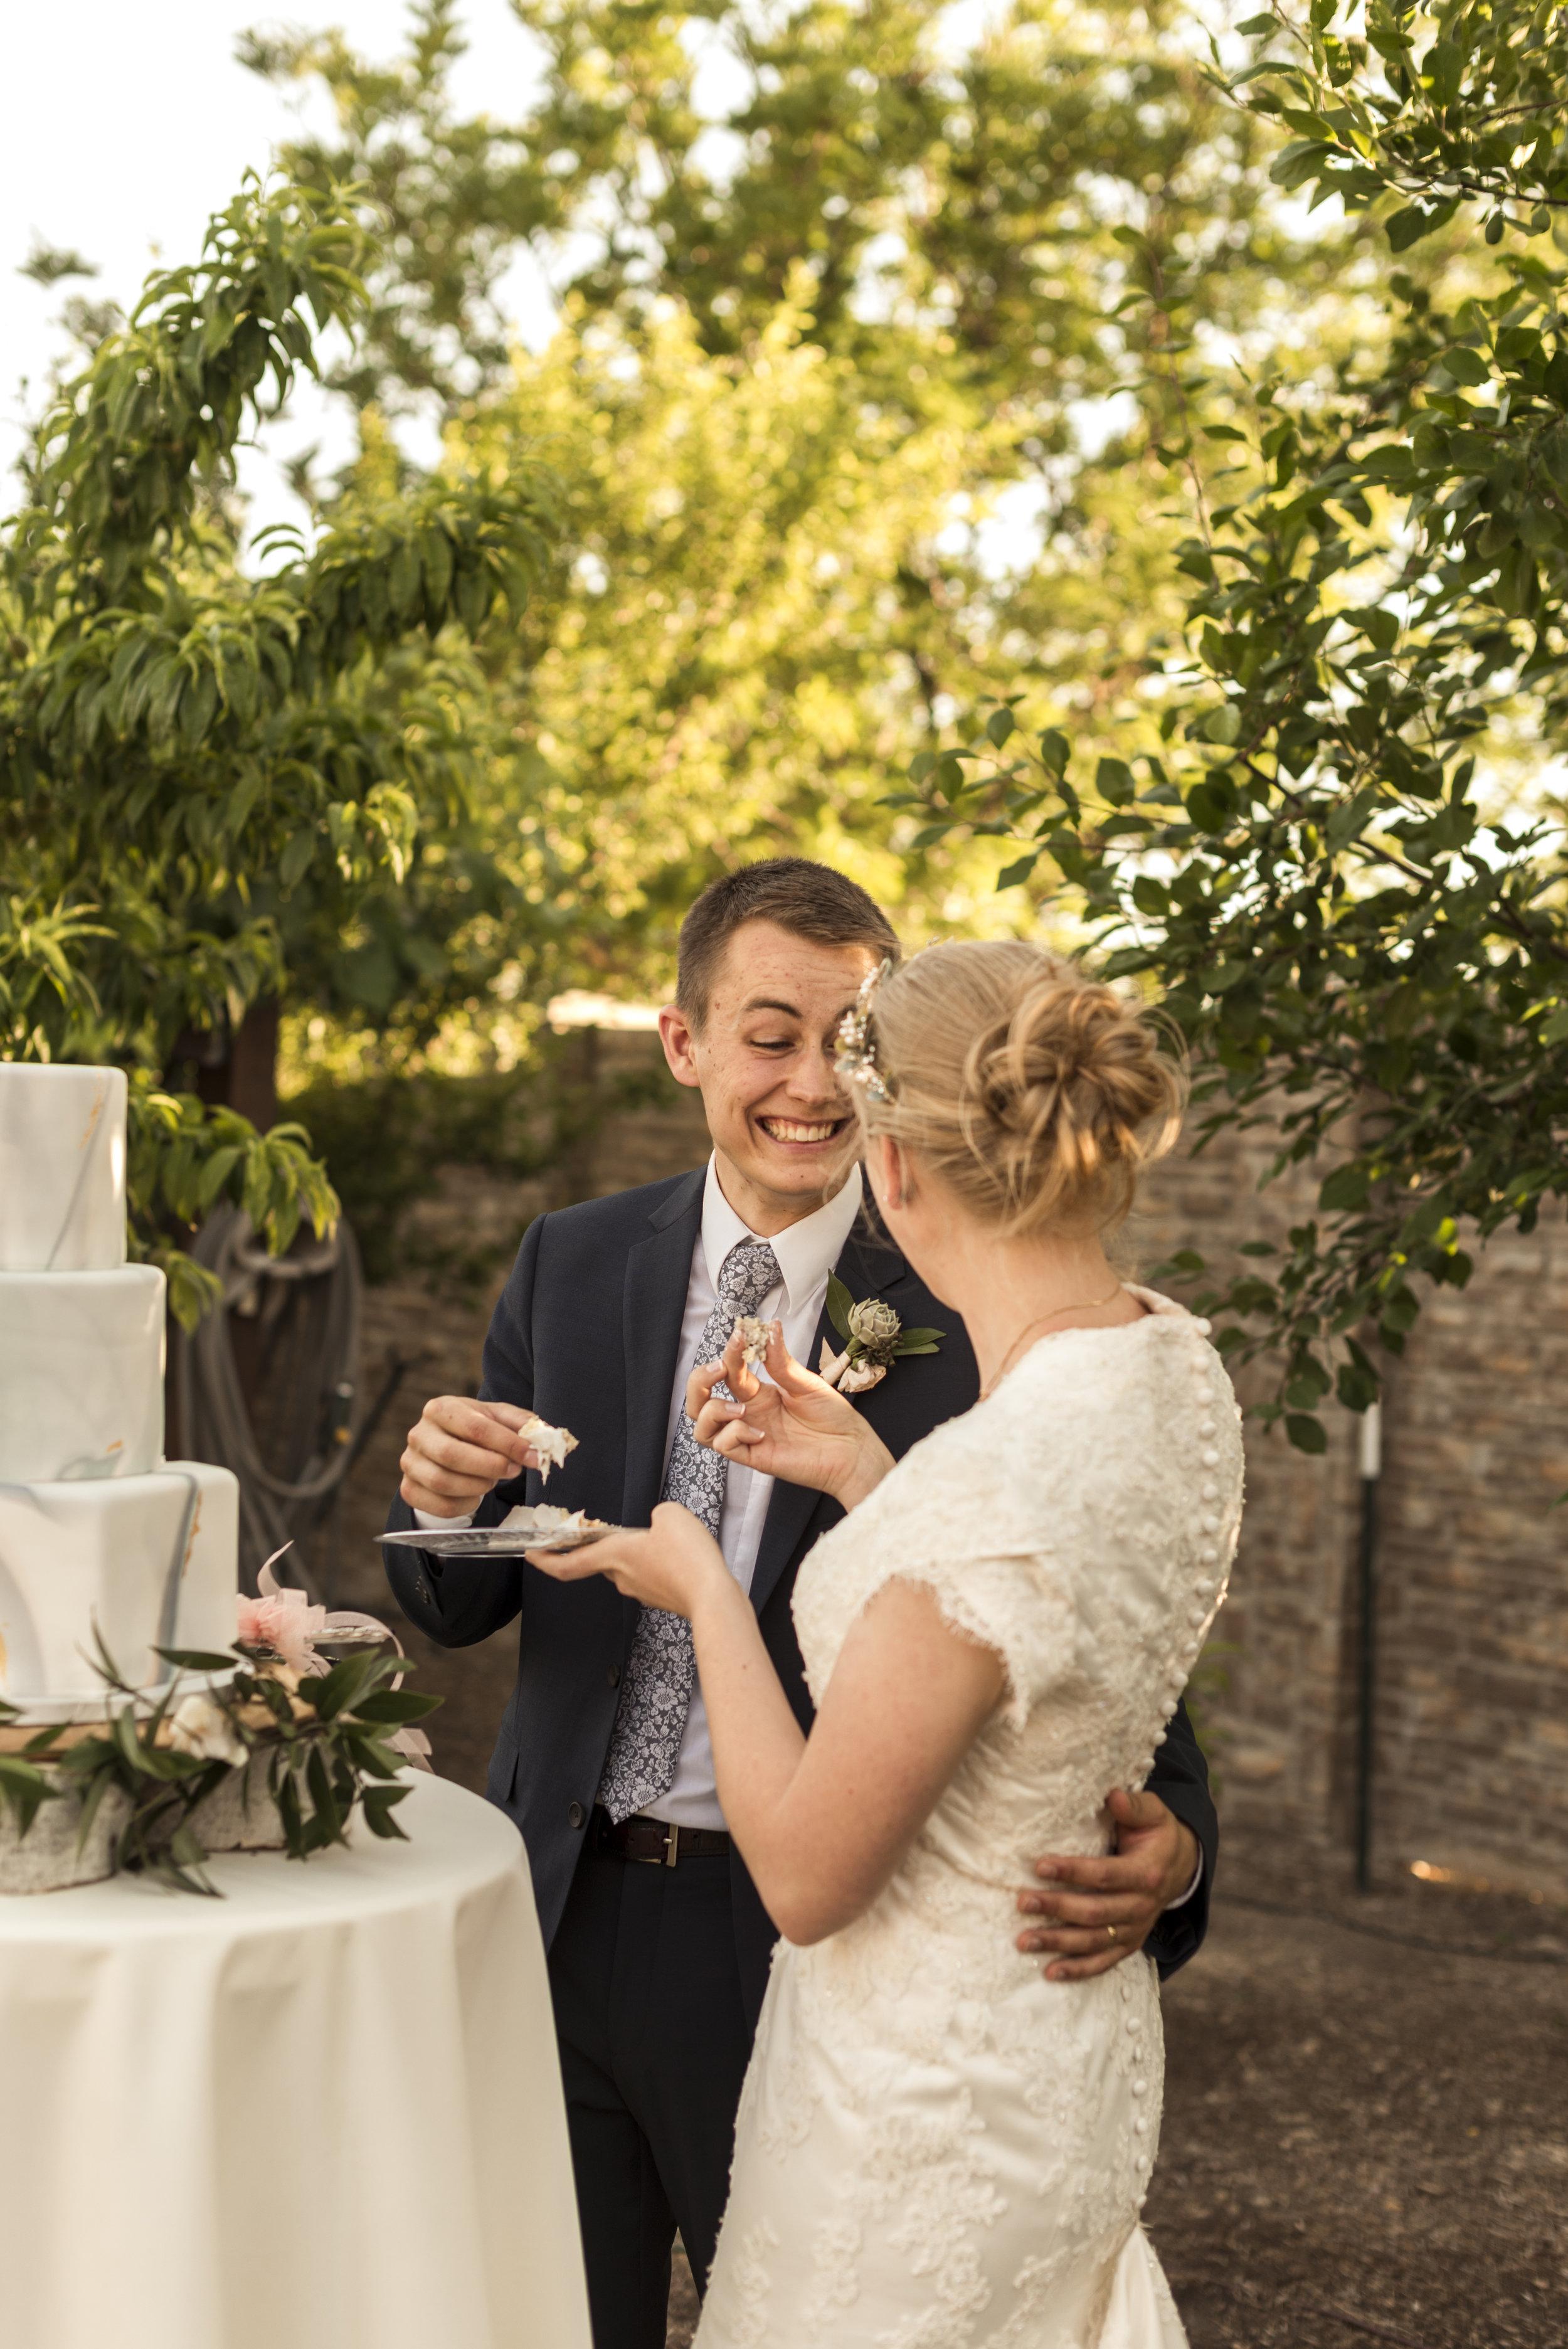 LDS Summer Wedding | South Jordan, Utah Wedding Photographer| Bri Bergman Photography 21.JPG